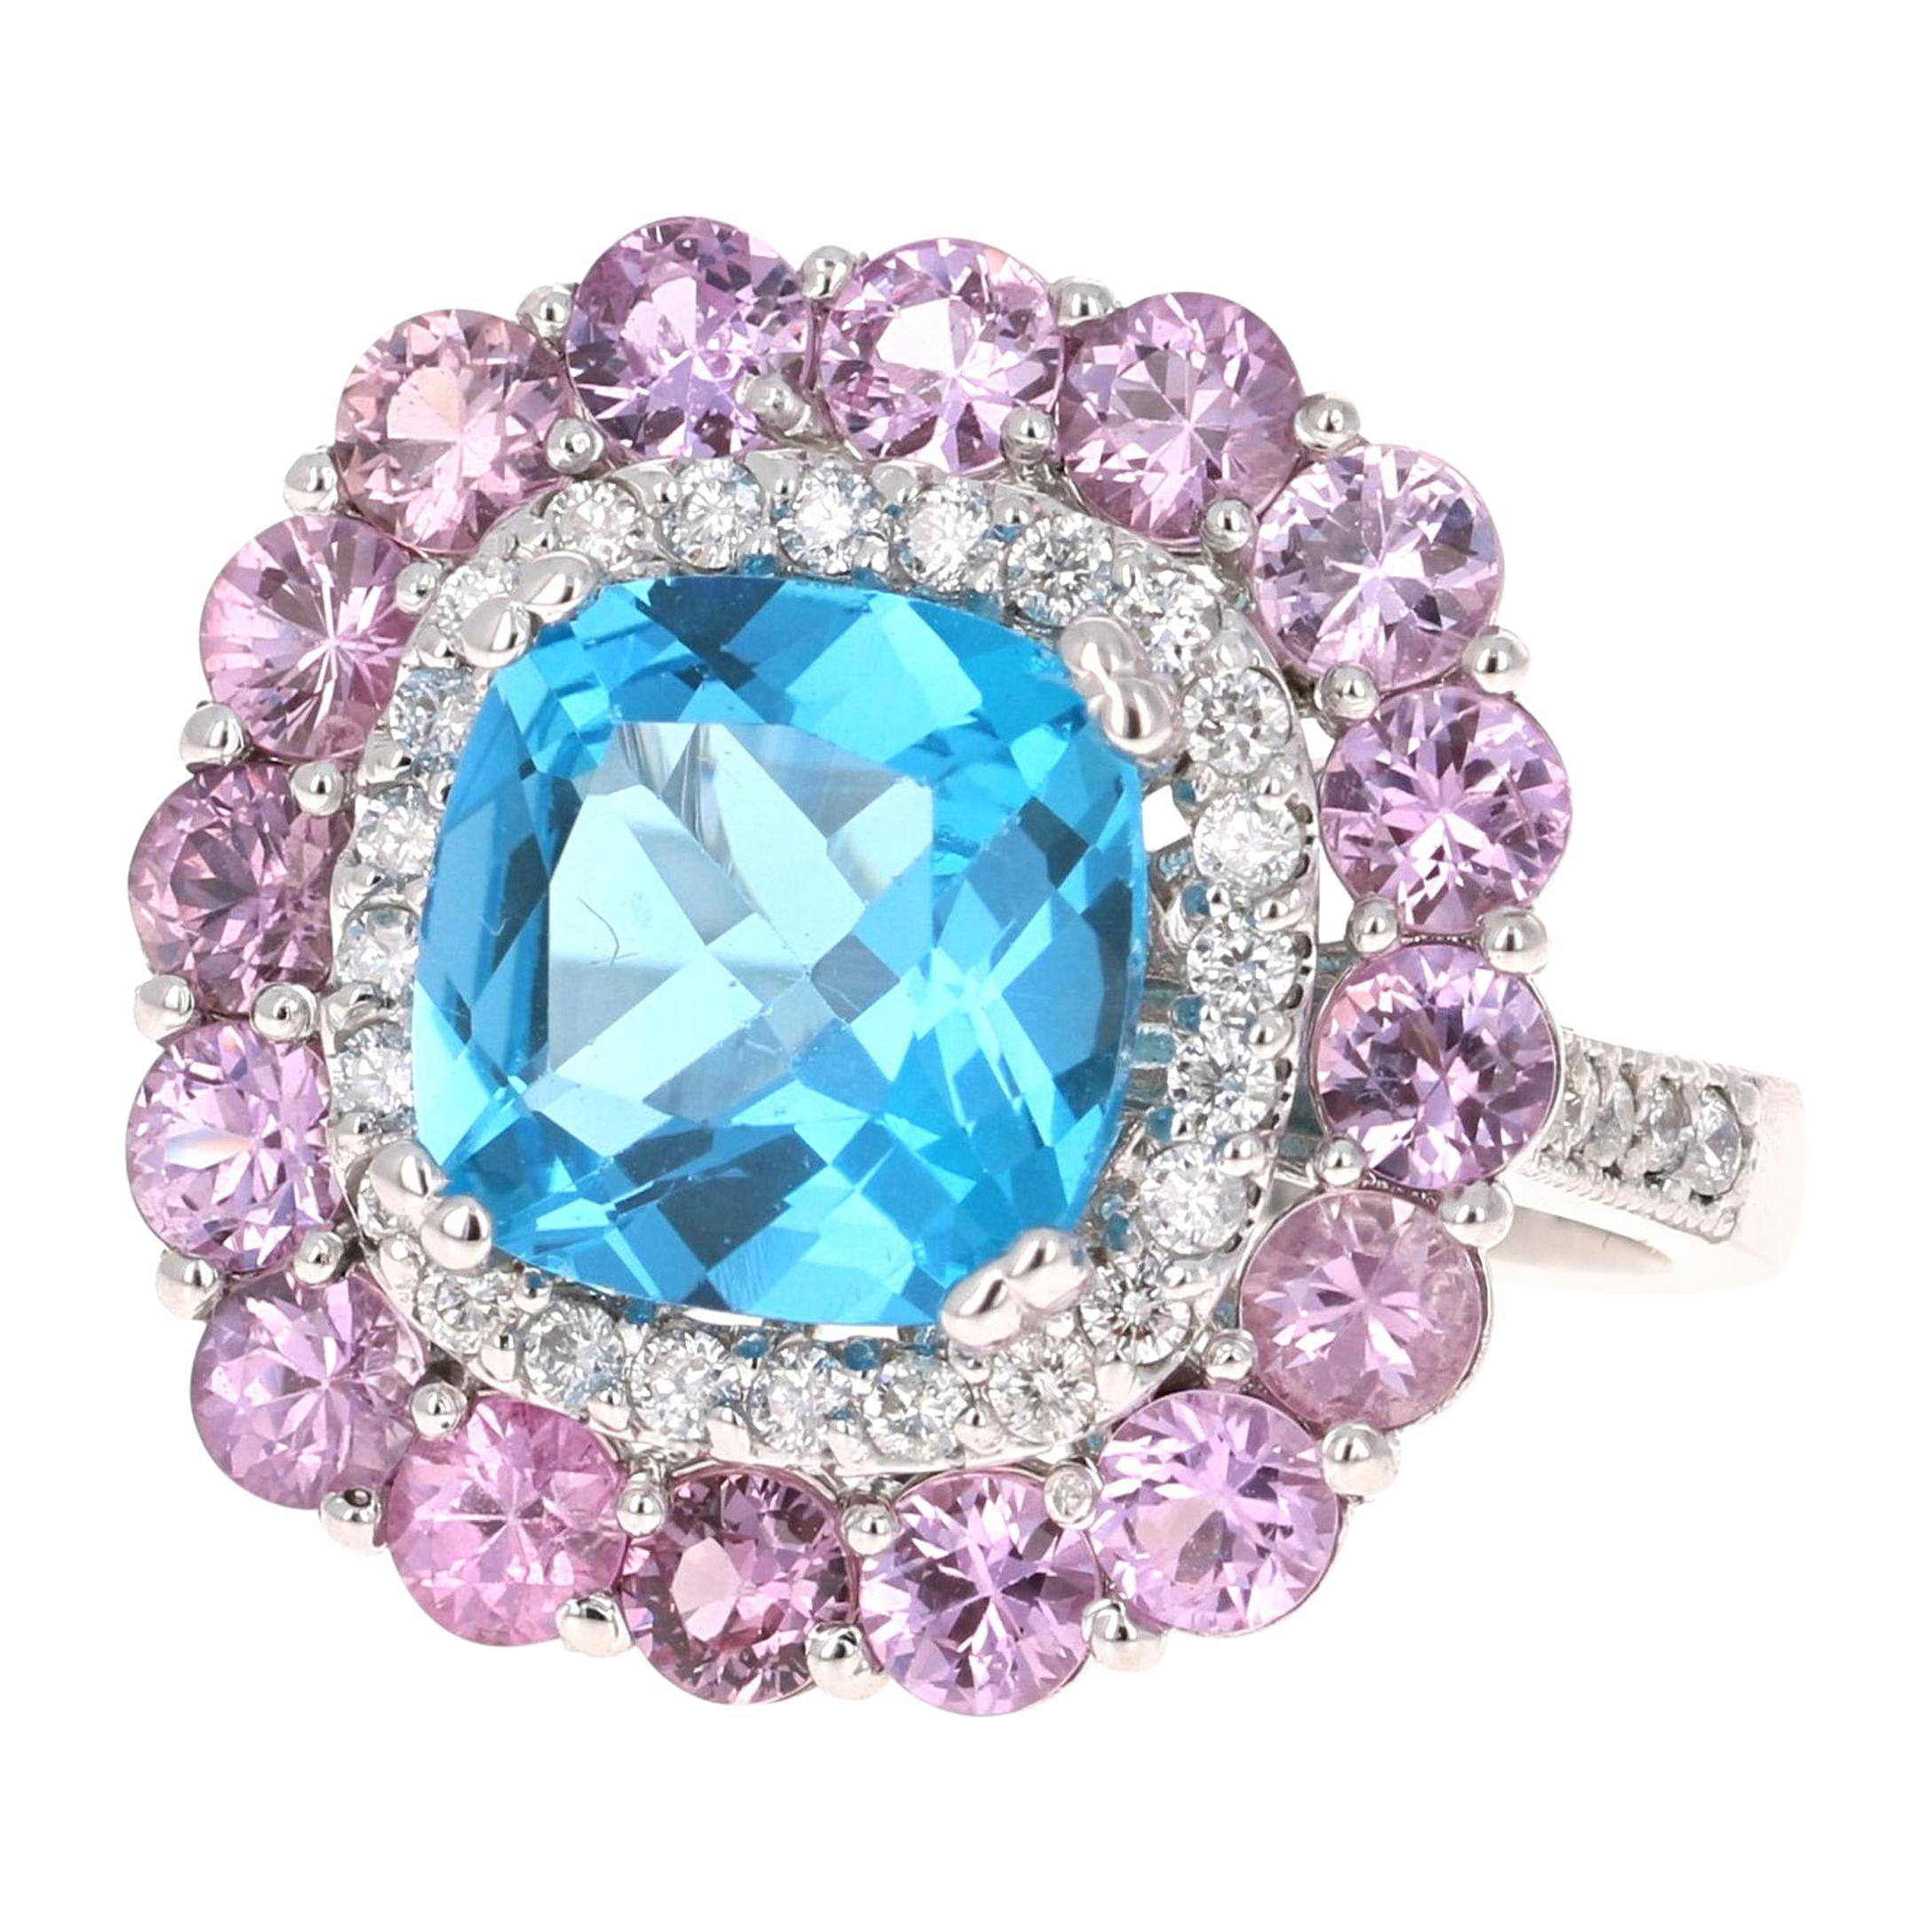 8.34 Carat Cushion Cut Blue Topaz Pink Sapphire Diamond White Gold Cocktail Ring